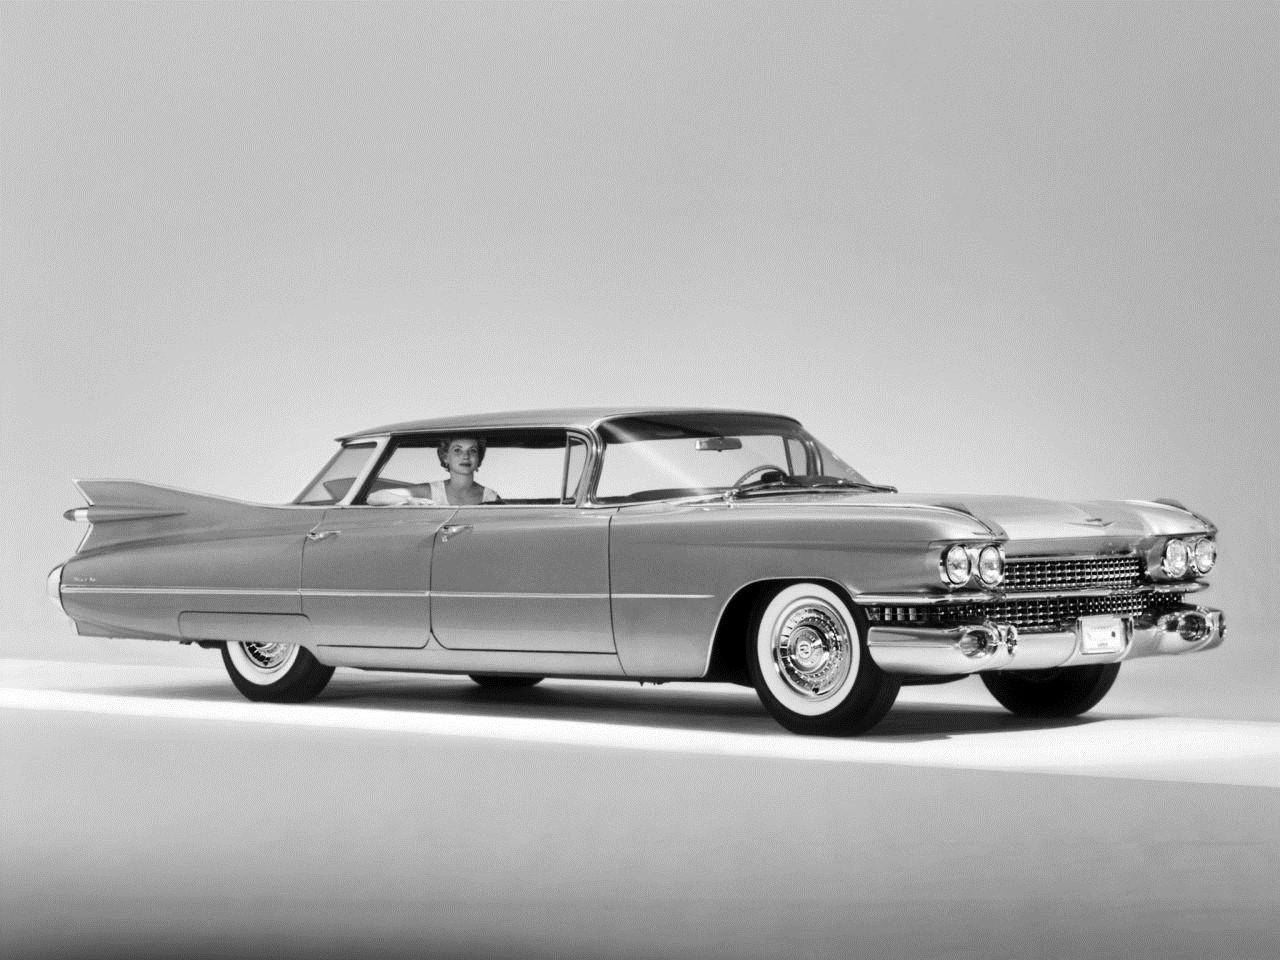 1959 Sedan deVille